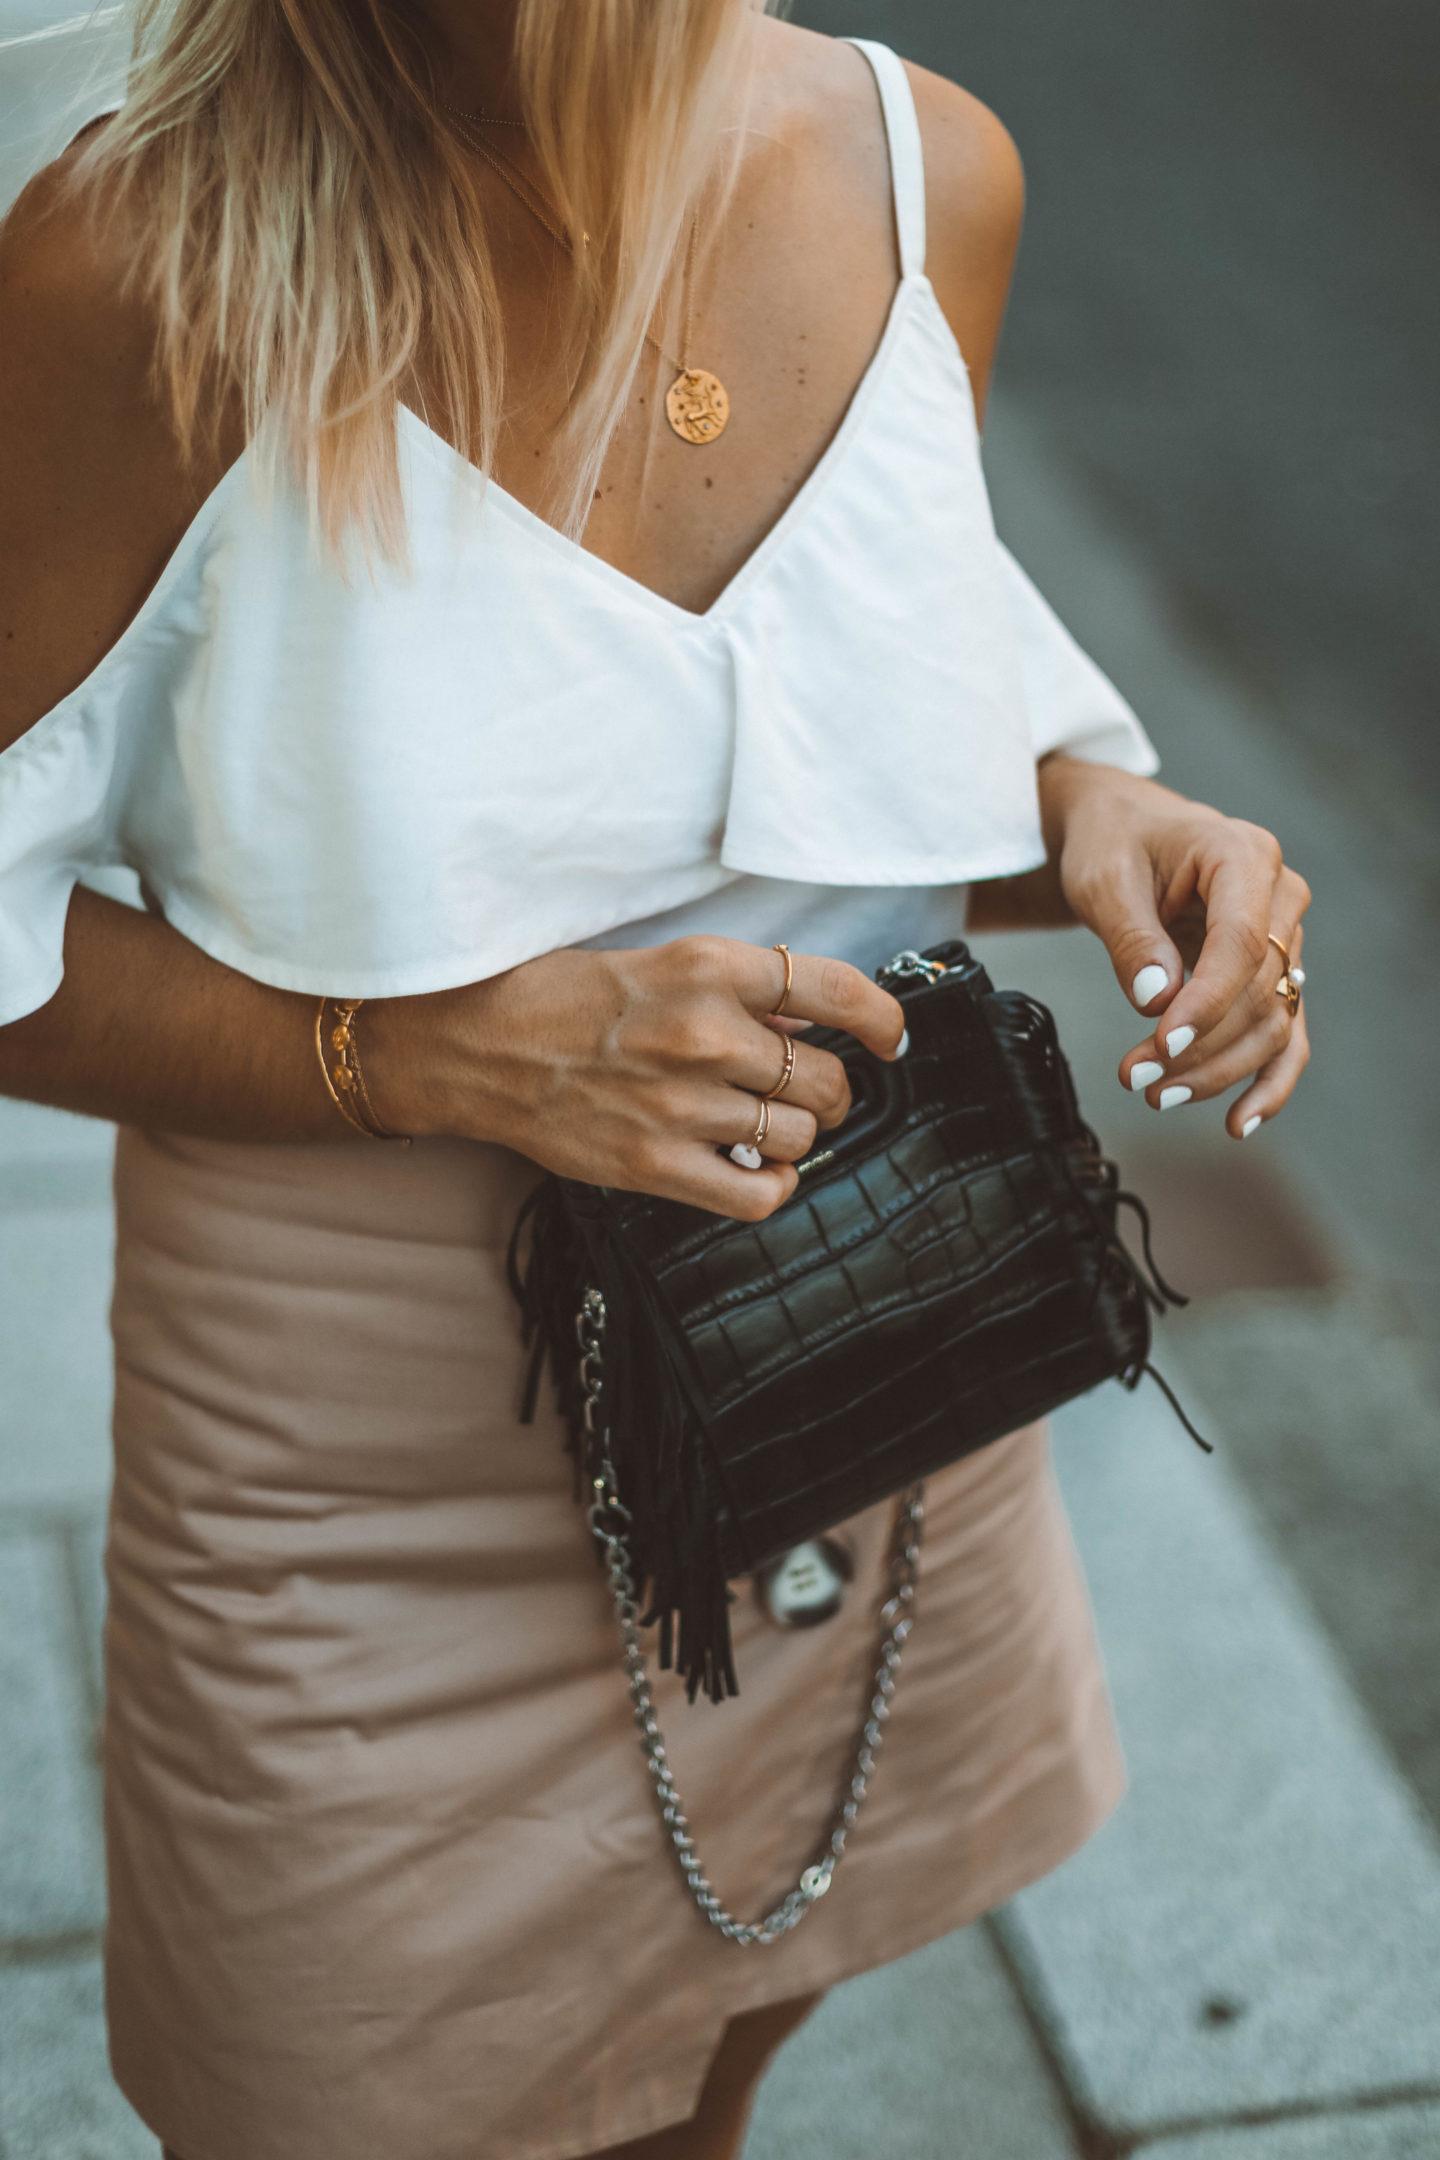 Sac Maje M Mini - Blondie baby blog mode Paris et voyages